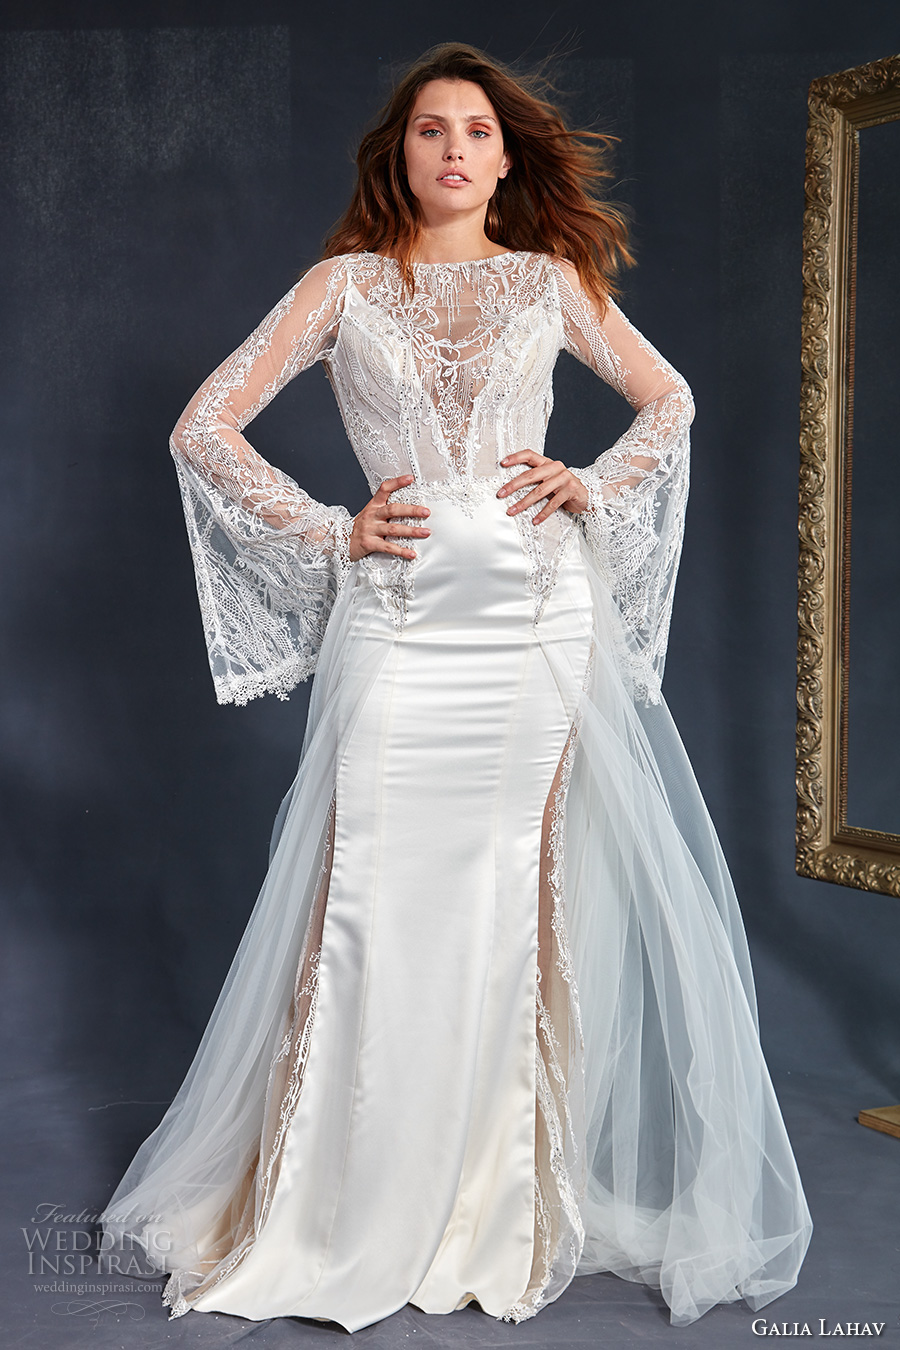 Galia Lahav Fall 2017 Wedding Dresses - BridalPulse